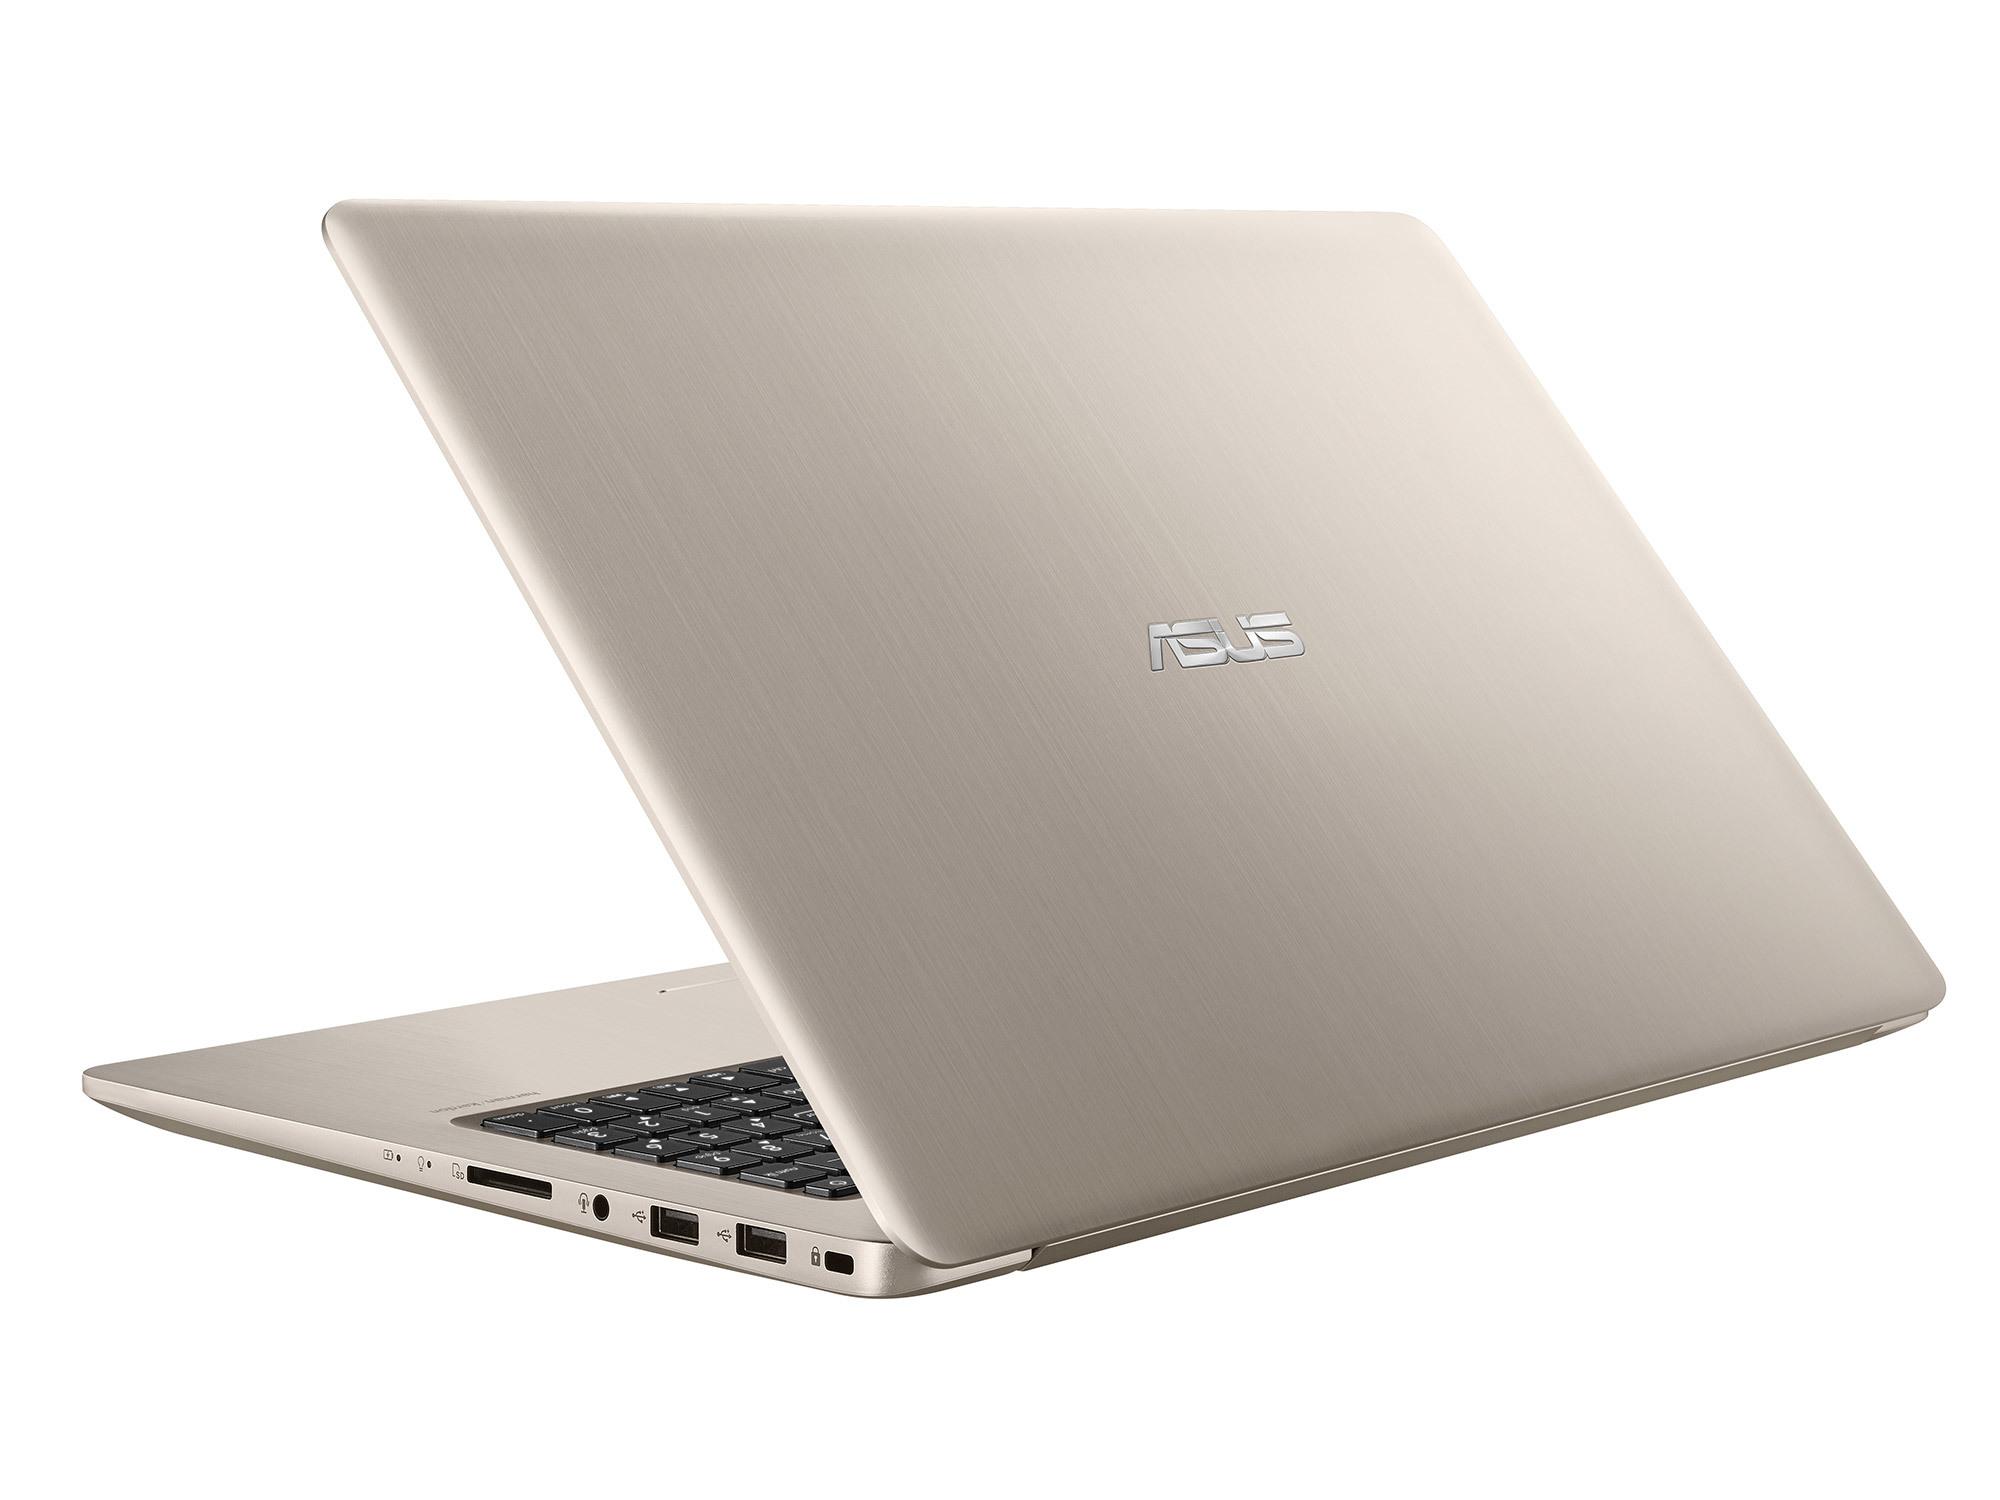 VivoBook Pro - N580VD-FI366T - Or métal